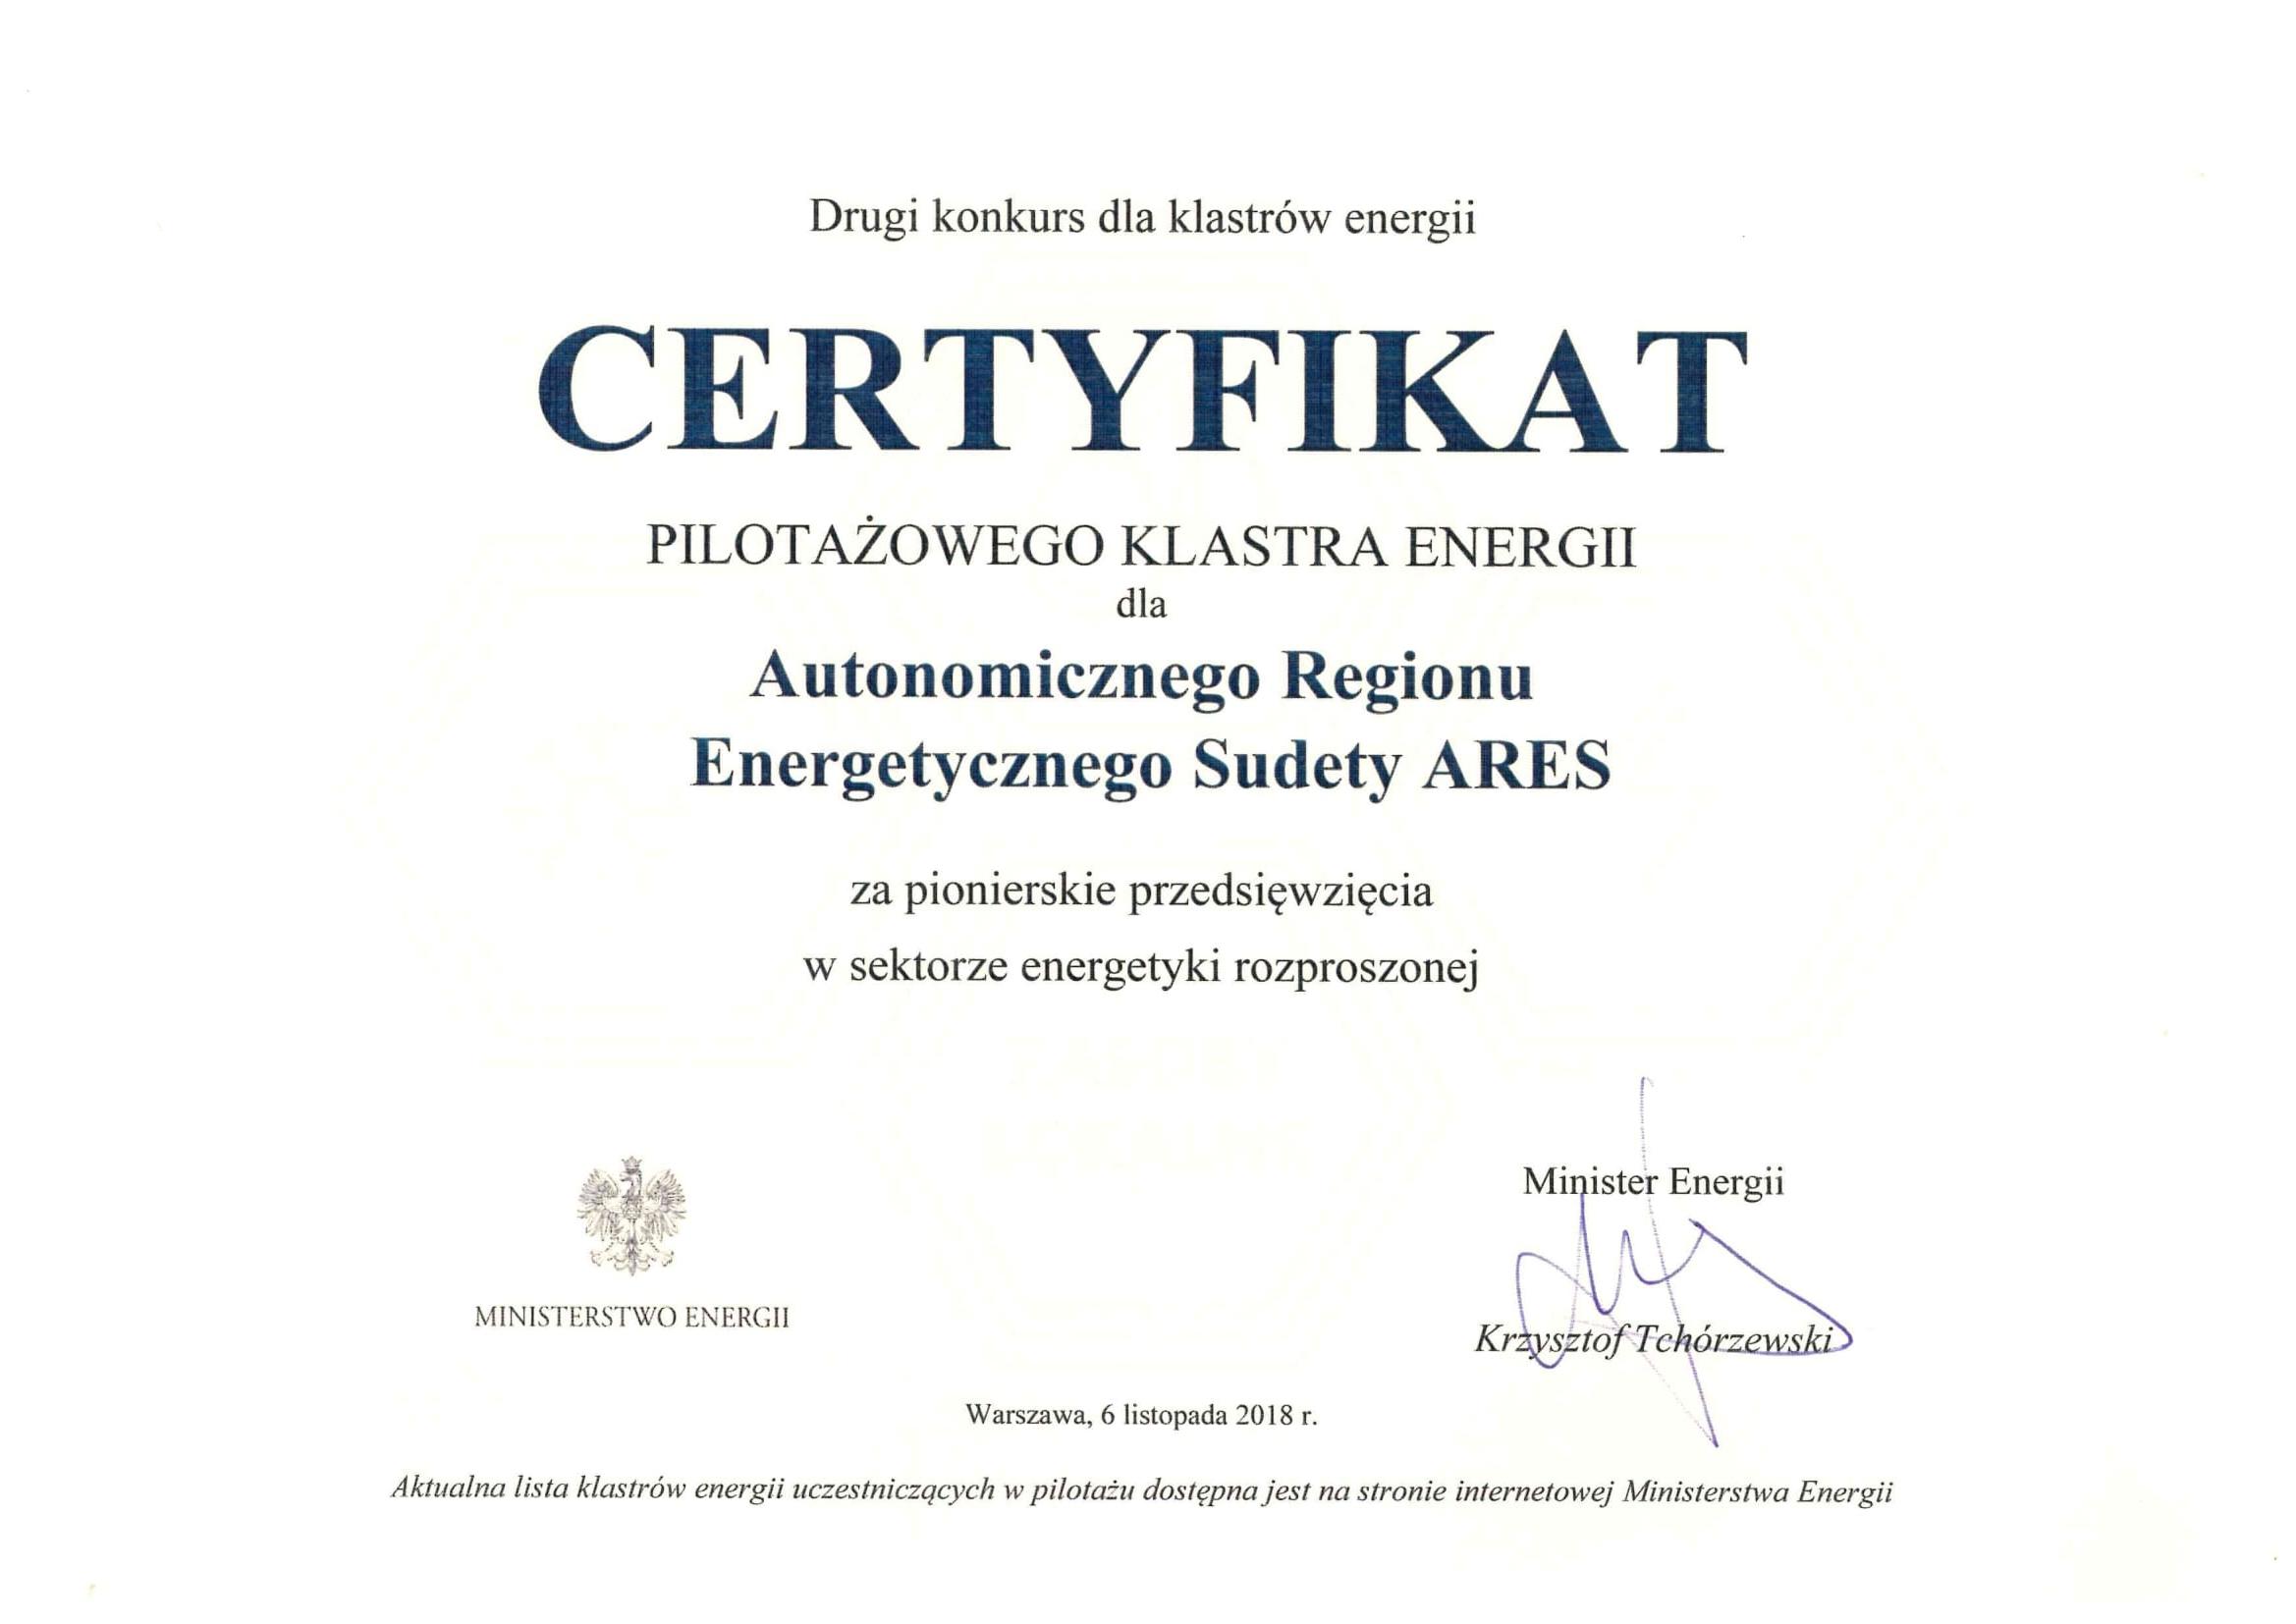 certyfikowany klaster energii ares